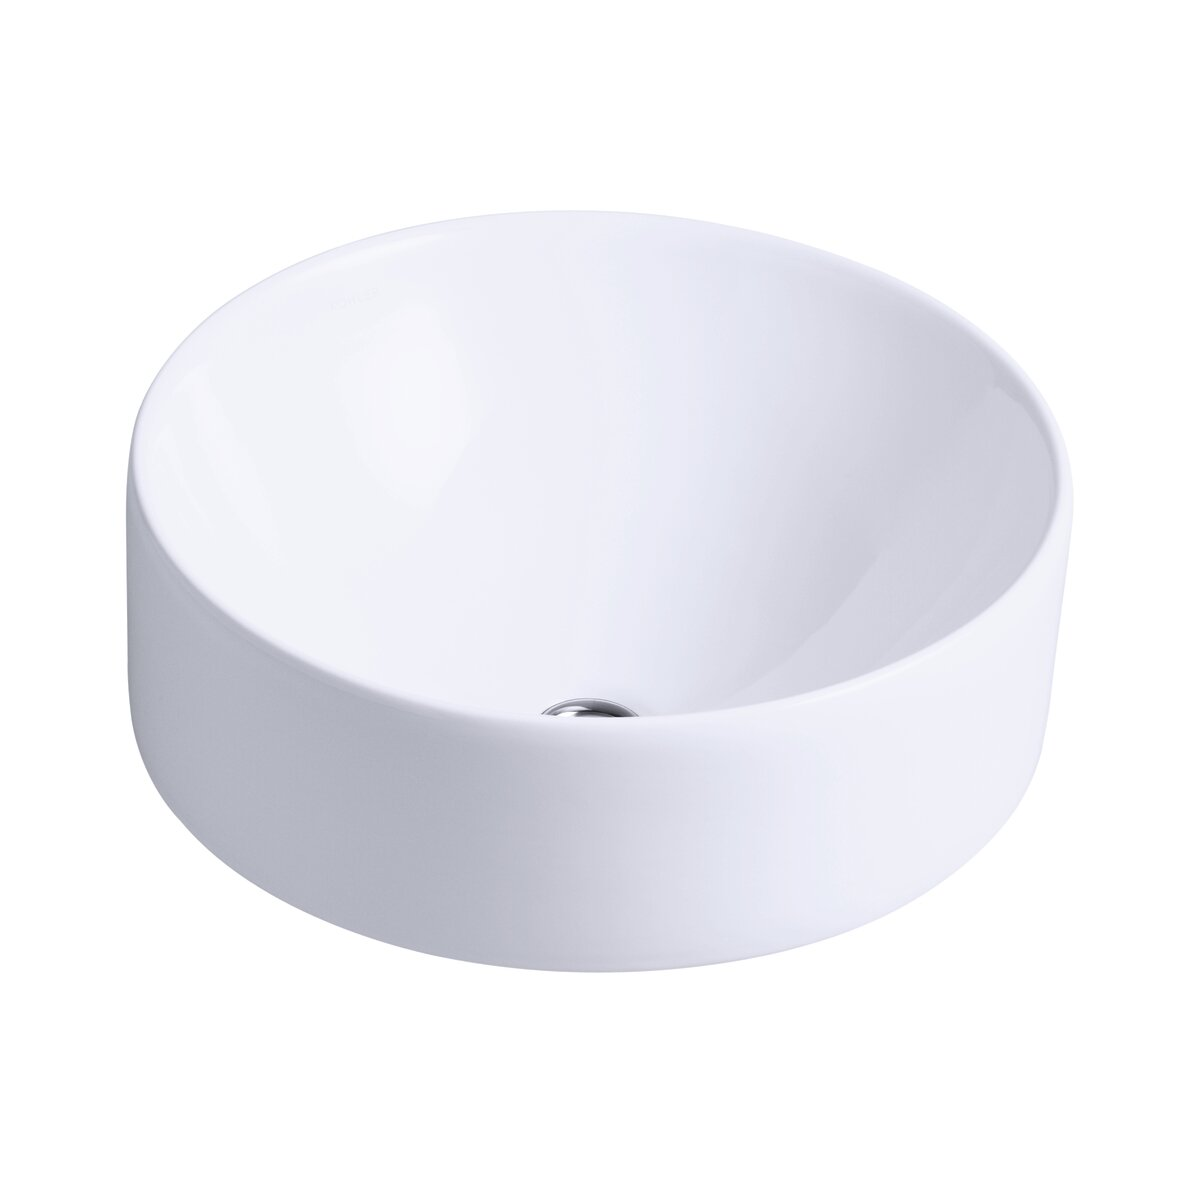 Delicieux K 14800 0,47,7 Kohler Vox Ceramic Circular Vessel Bathroom Sink With  Overflow U0026 Reviews | Wayfair